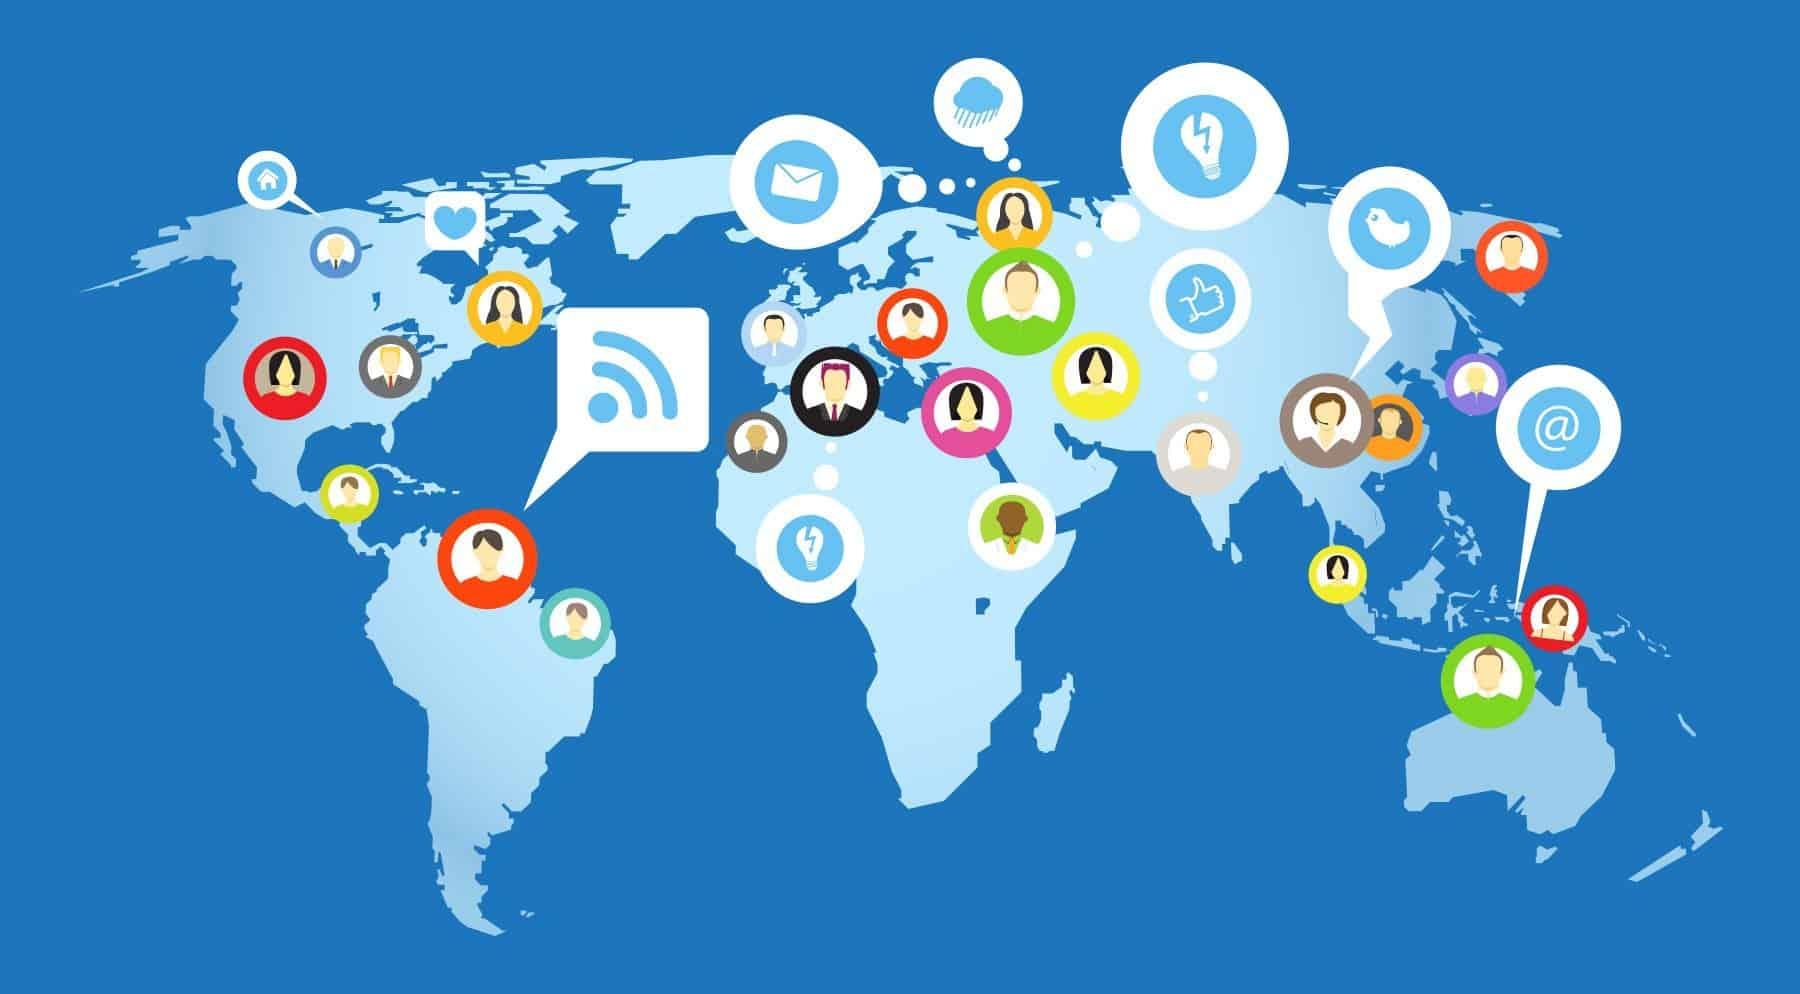 Importance of Social Media in Nigeria